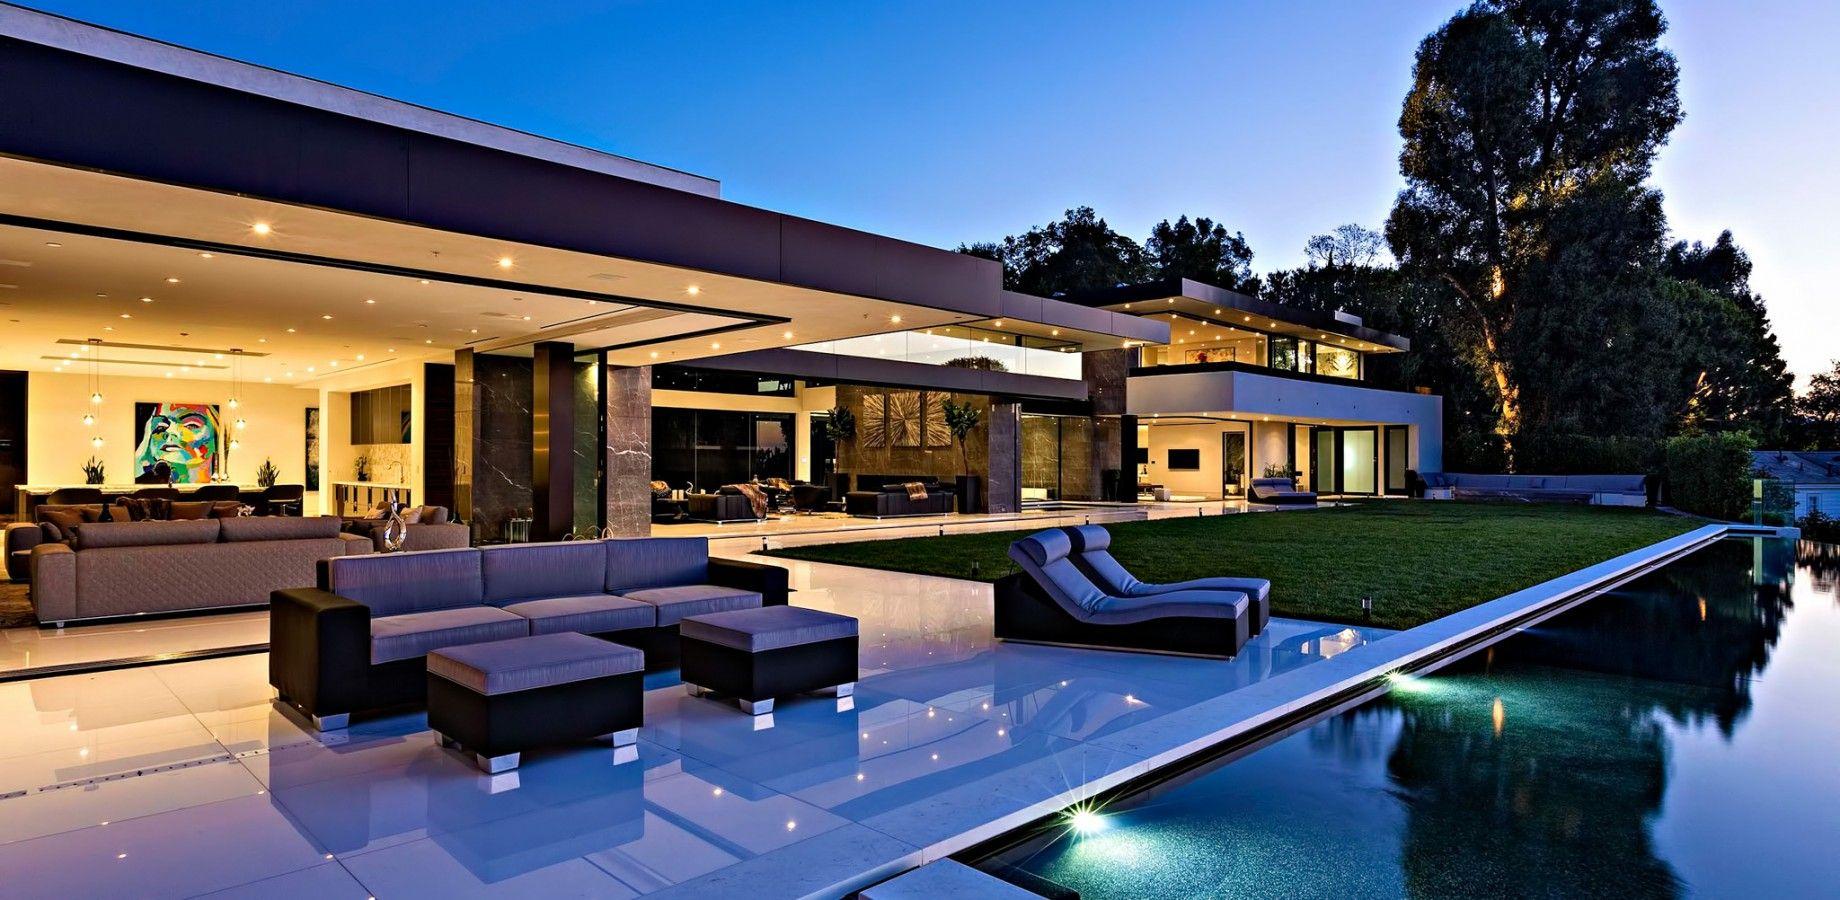 Best Kitchen Gallery: 55 Million Bel Air Luxury Residence 864 Stradella Road Los of Modern Homes For Sale Los Angeles  on rachelxblog.com